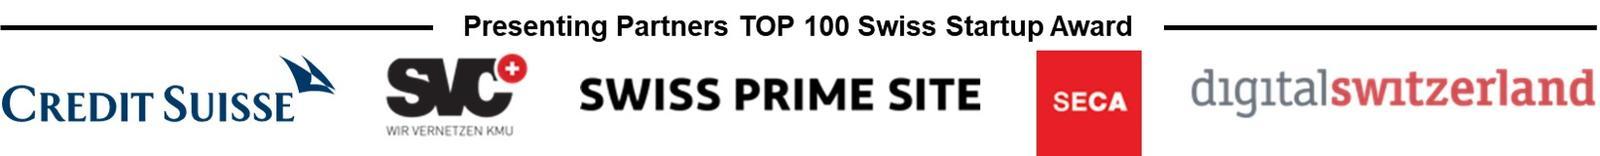 [Livestream] TOP 100 Swiss Startup Award 2020